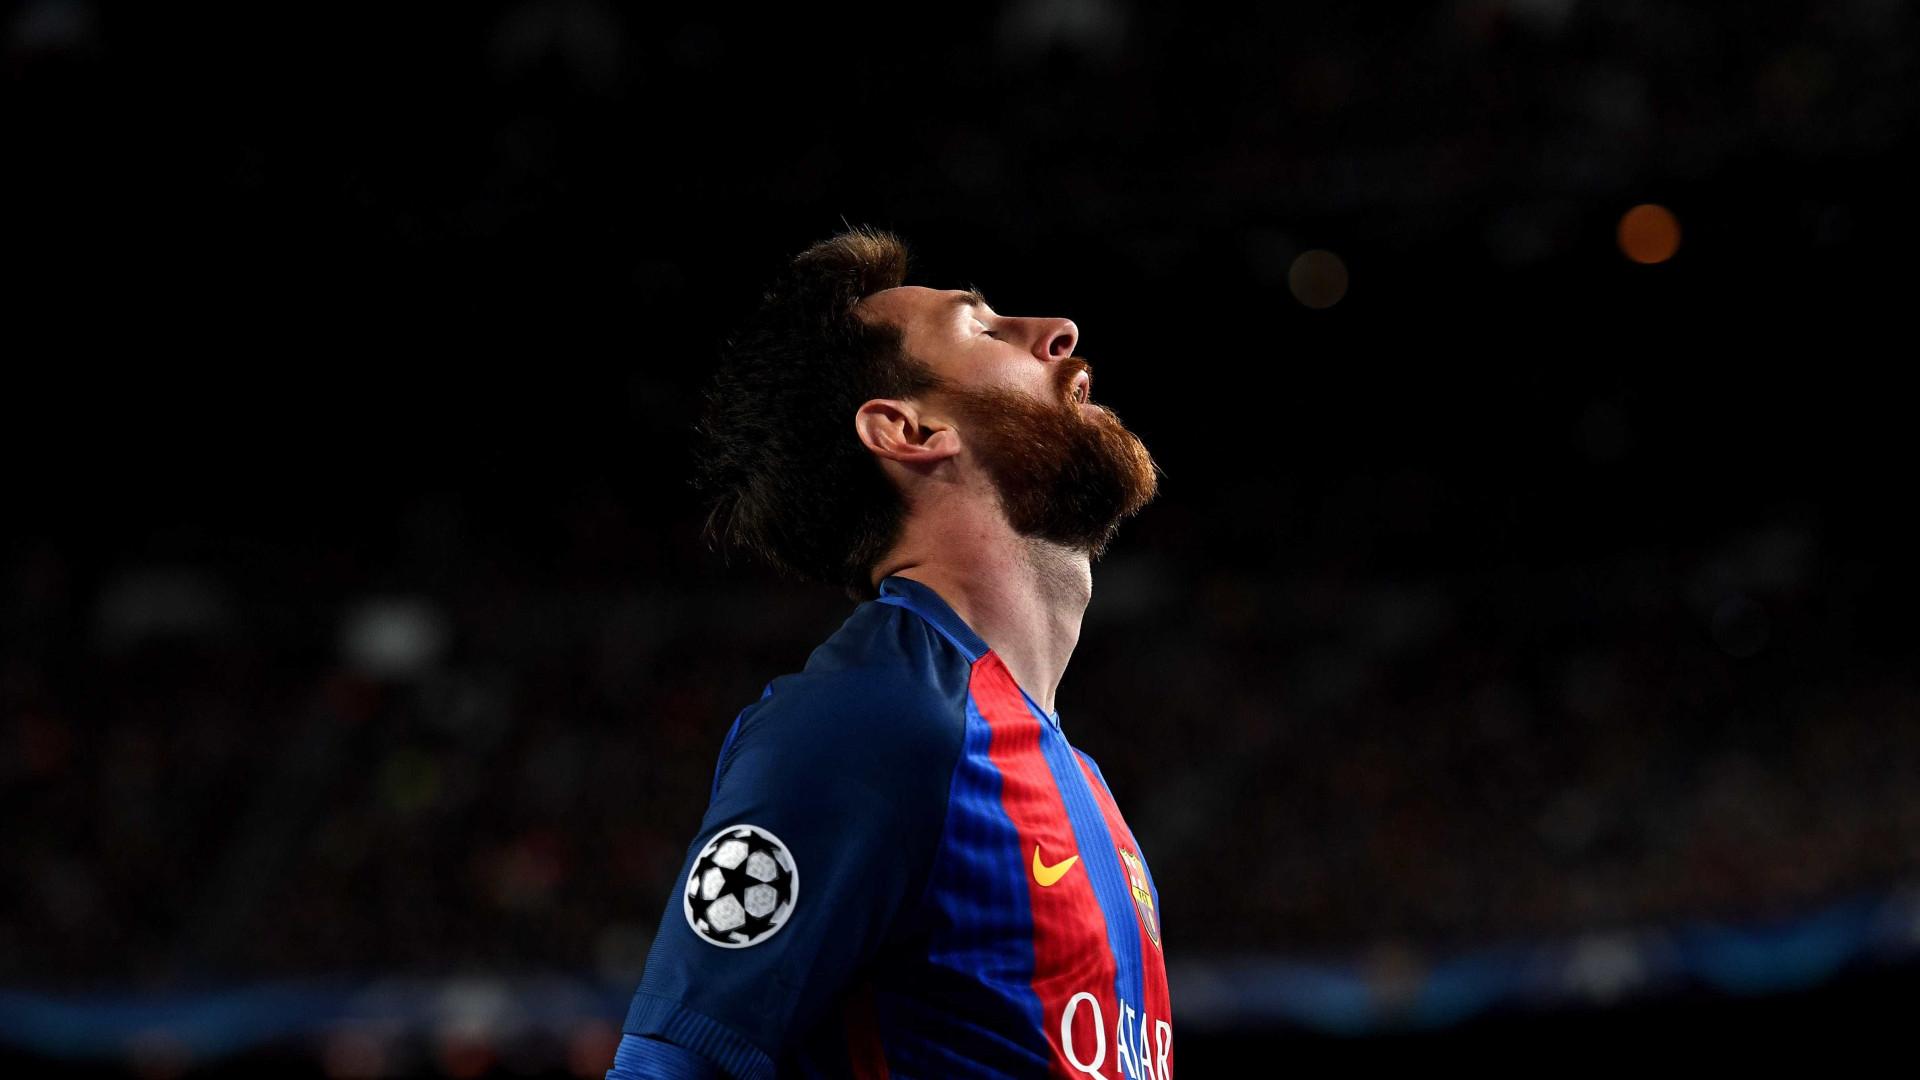 Messi desmente fatura de quase 38 mil euros que circula nas redes sociais